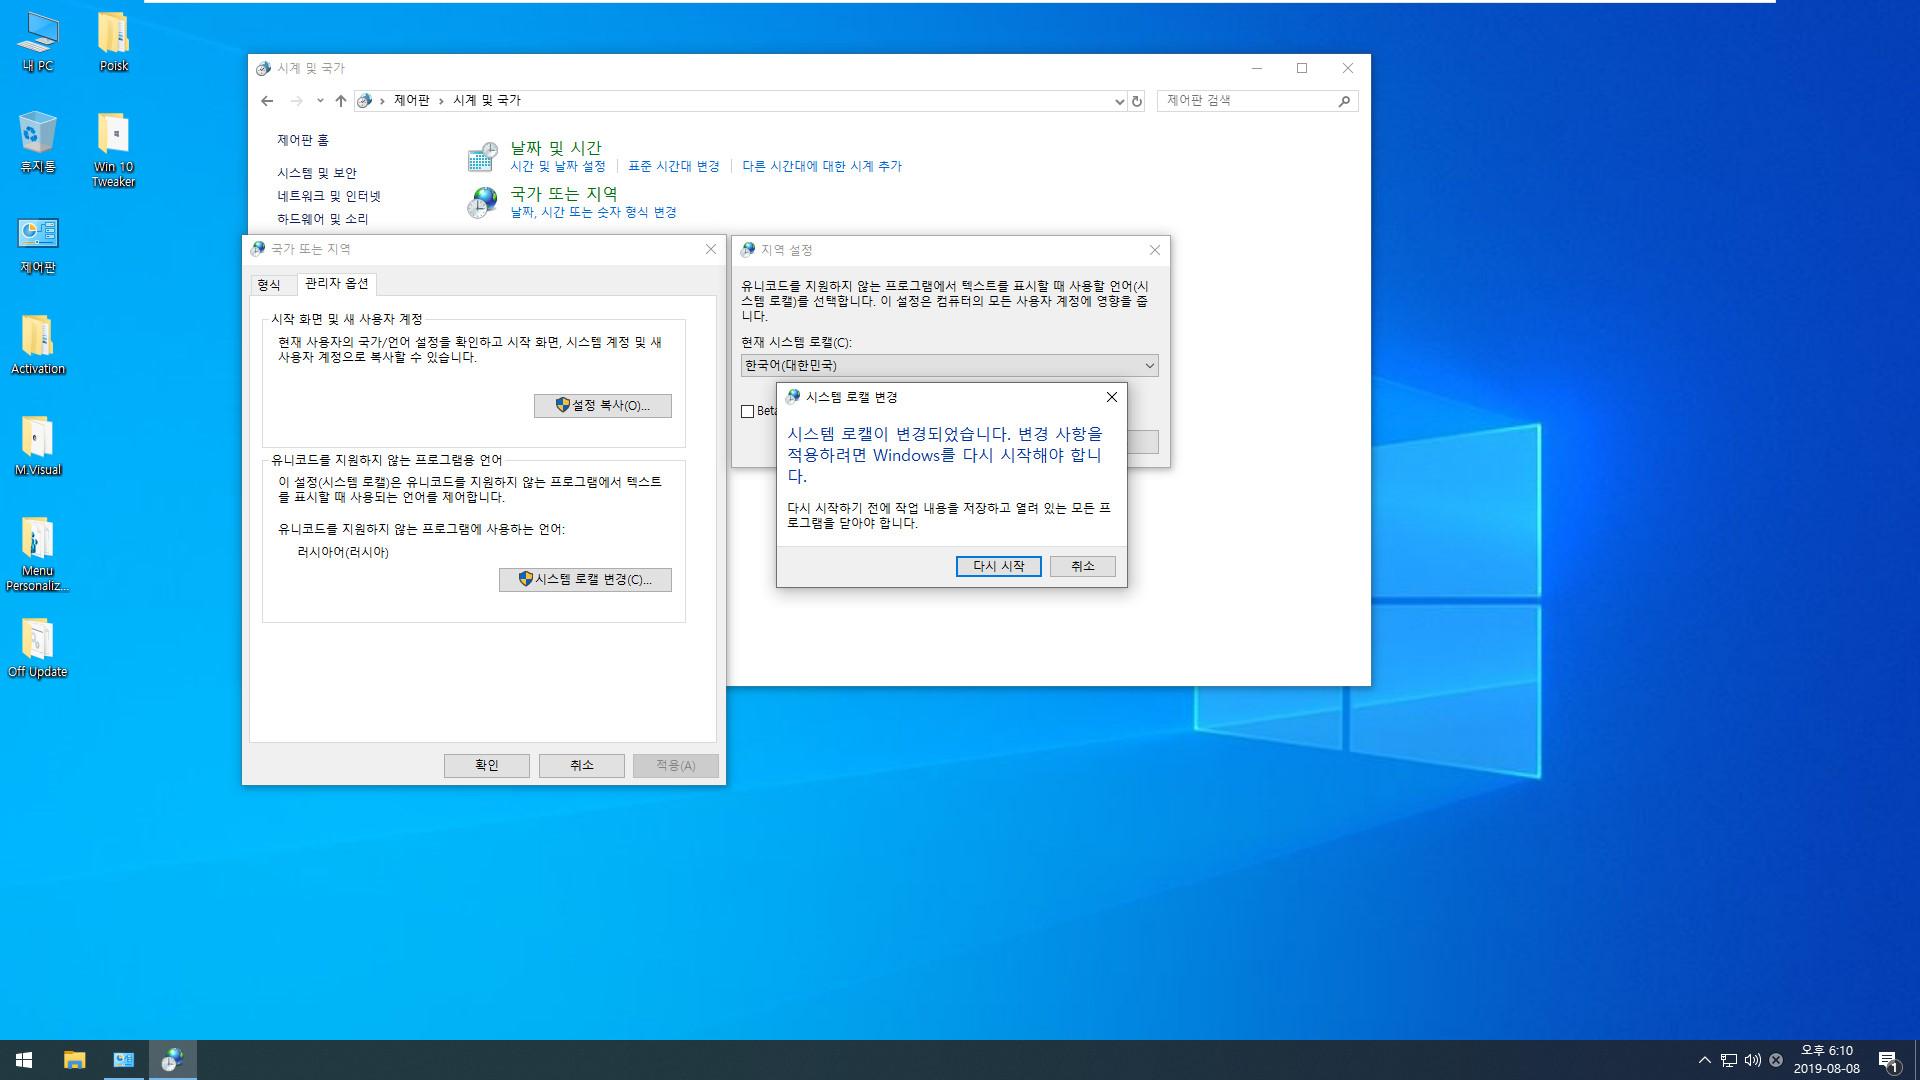 Windows 10 Enterprise x64 lite 1903 build 18362.267 by Zosma.iso - 러시아어 한글화 시도 - 그래서 그냥 원본대로 설치 후에 한글화 시도 2019-08-09_001047.jpg